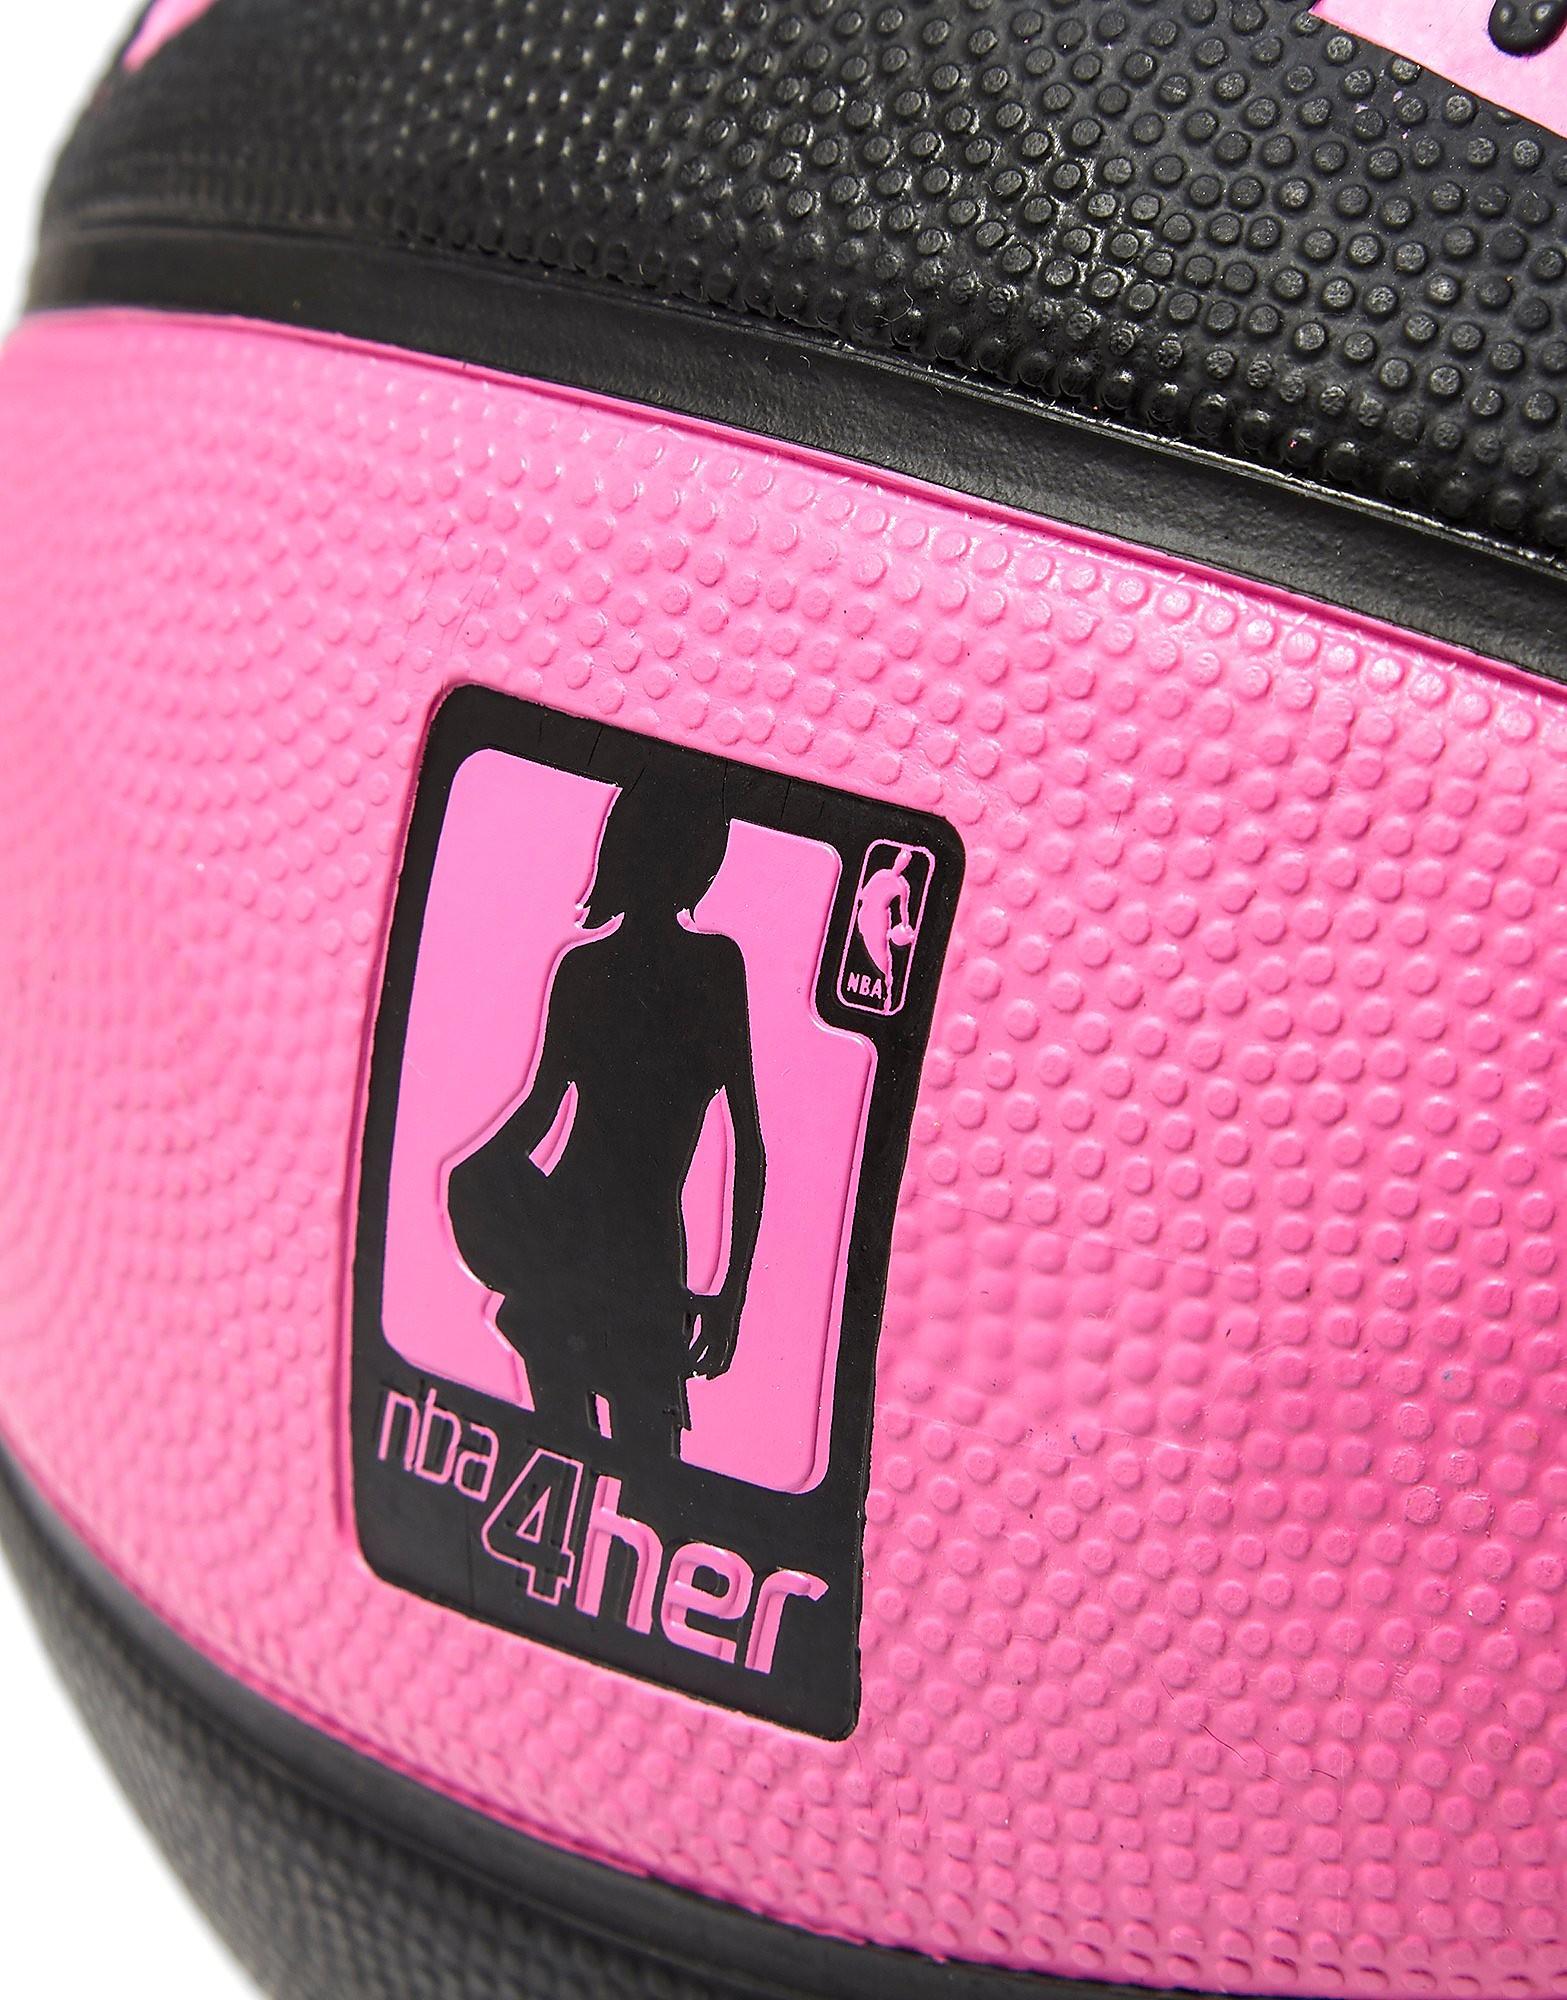 Spalding NBA 4Her Basketball